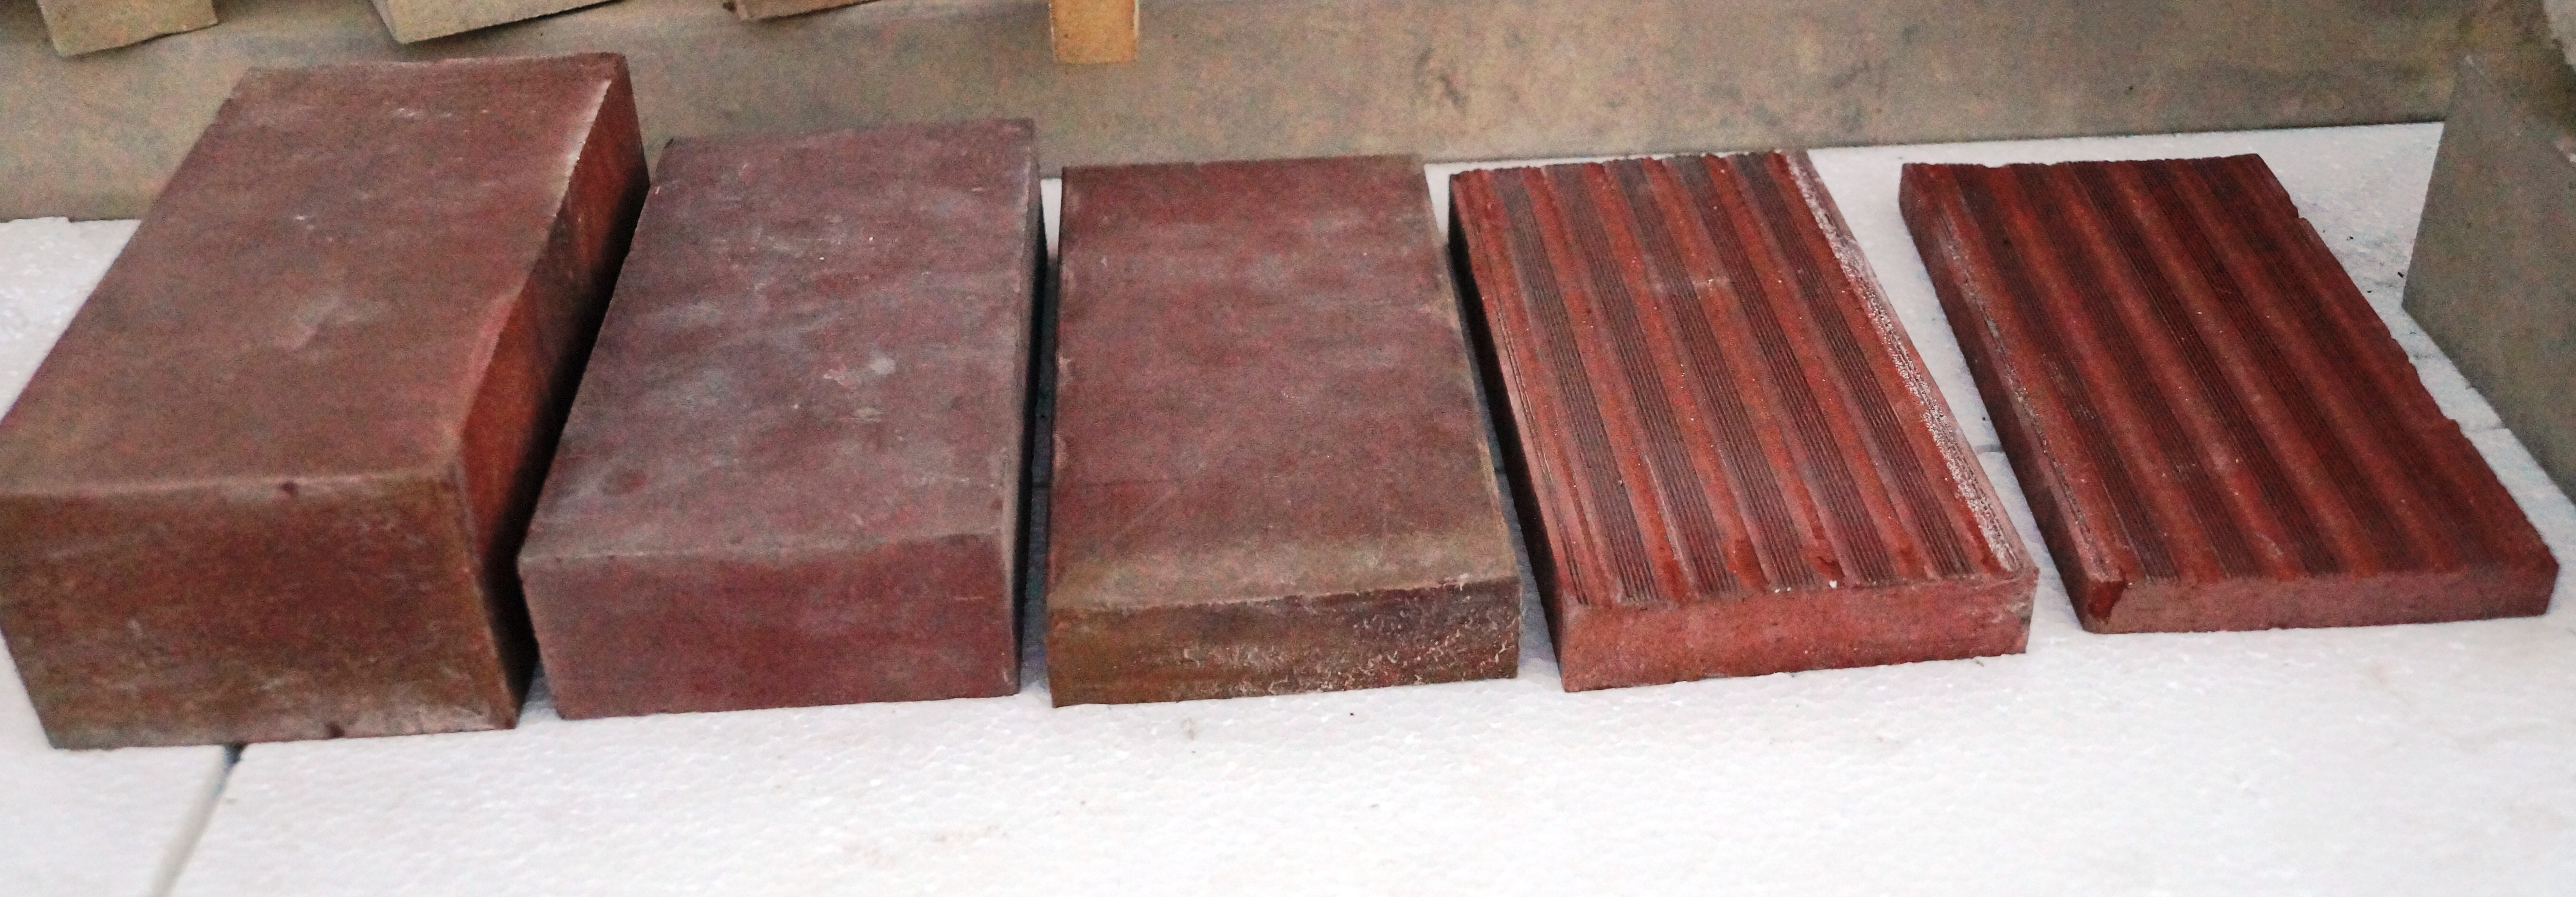 Acid Proof Tiles Suppliers Bricks Manufacturer In Ahmedabad